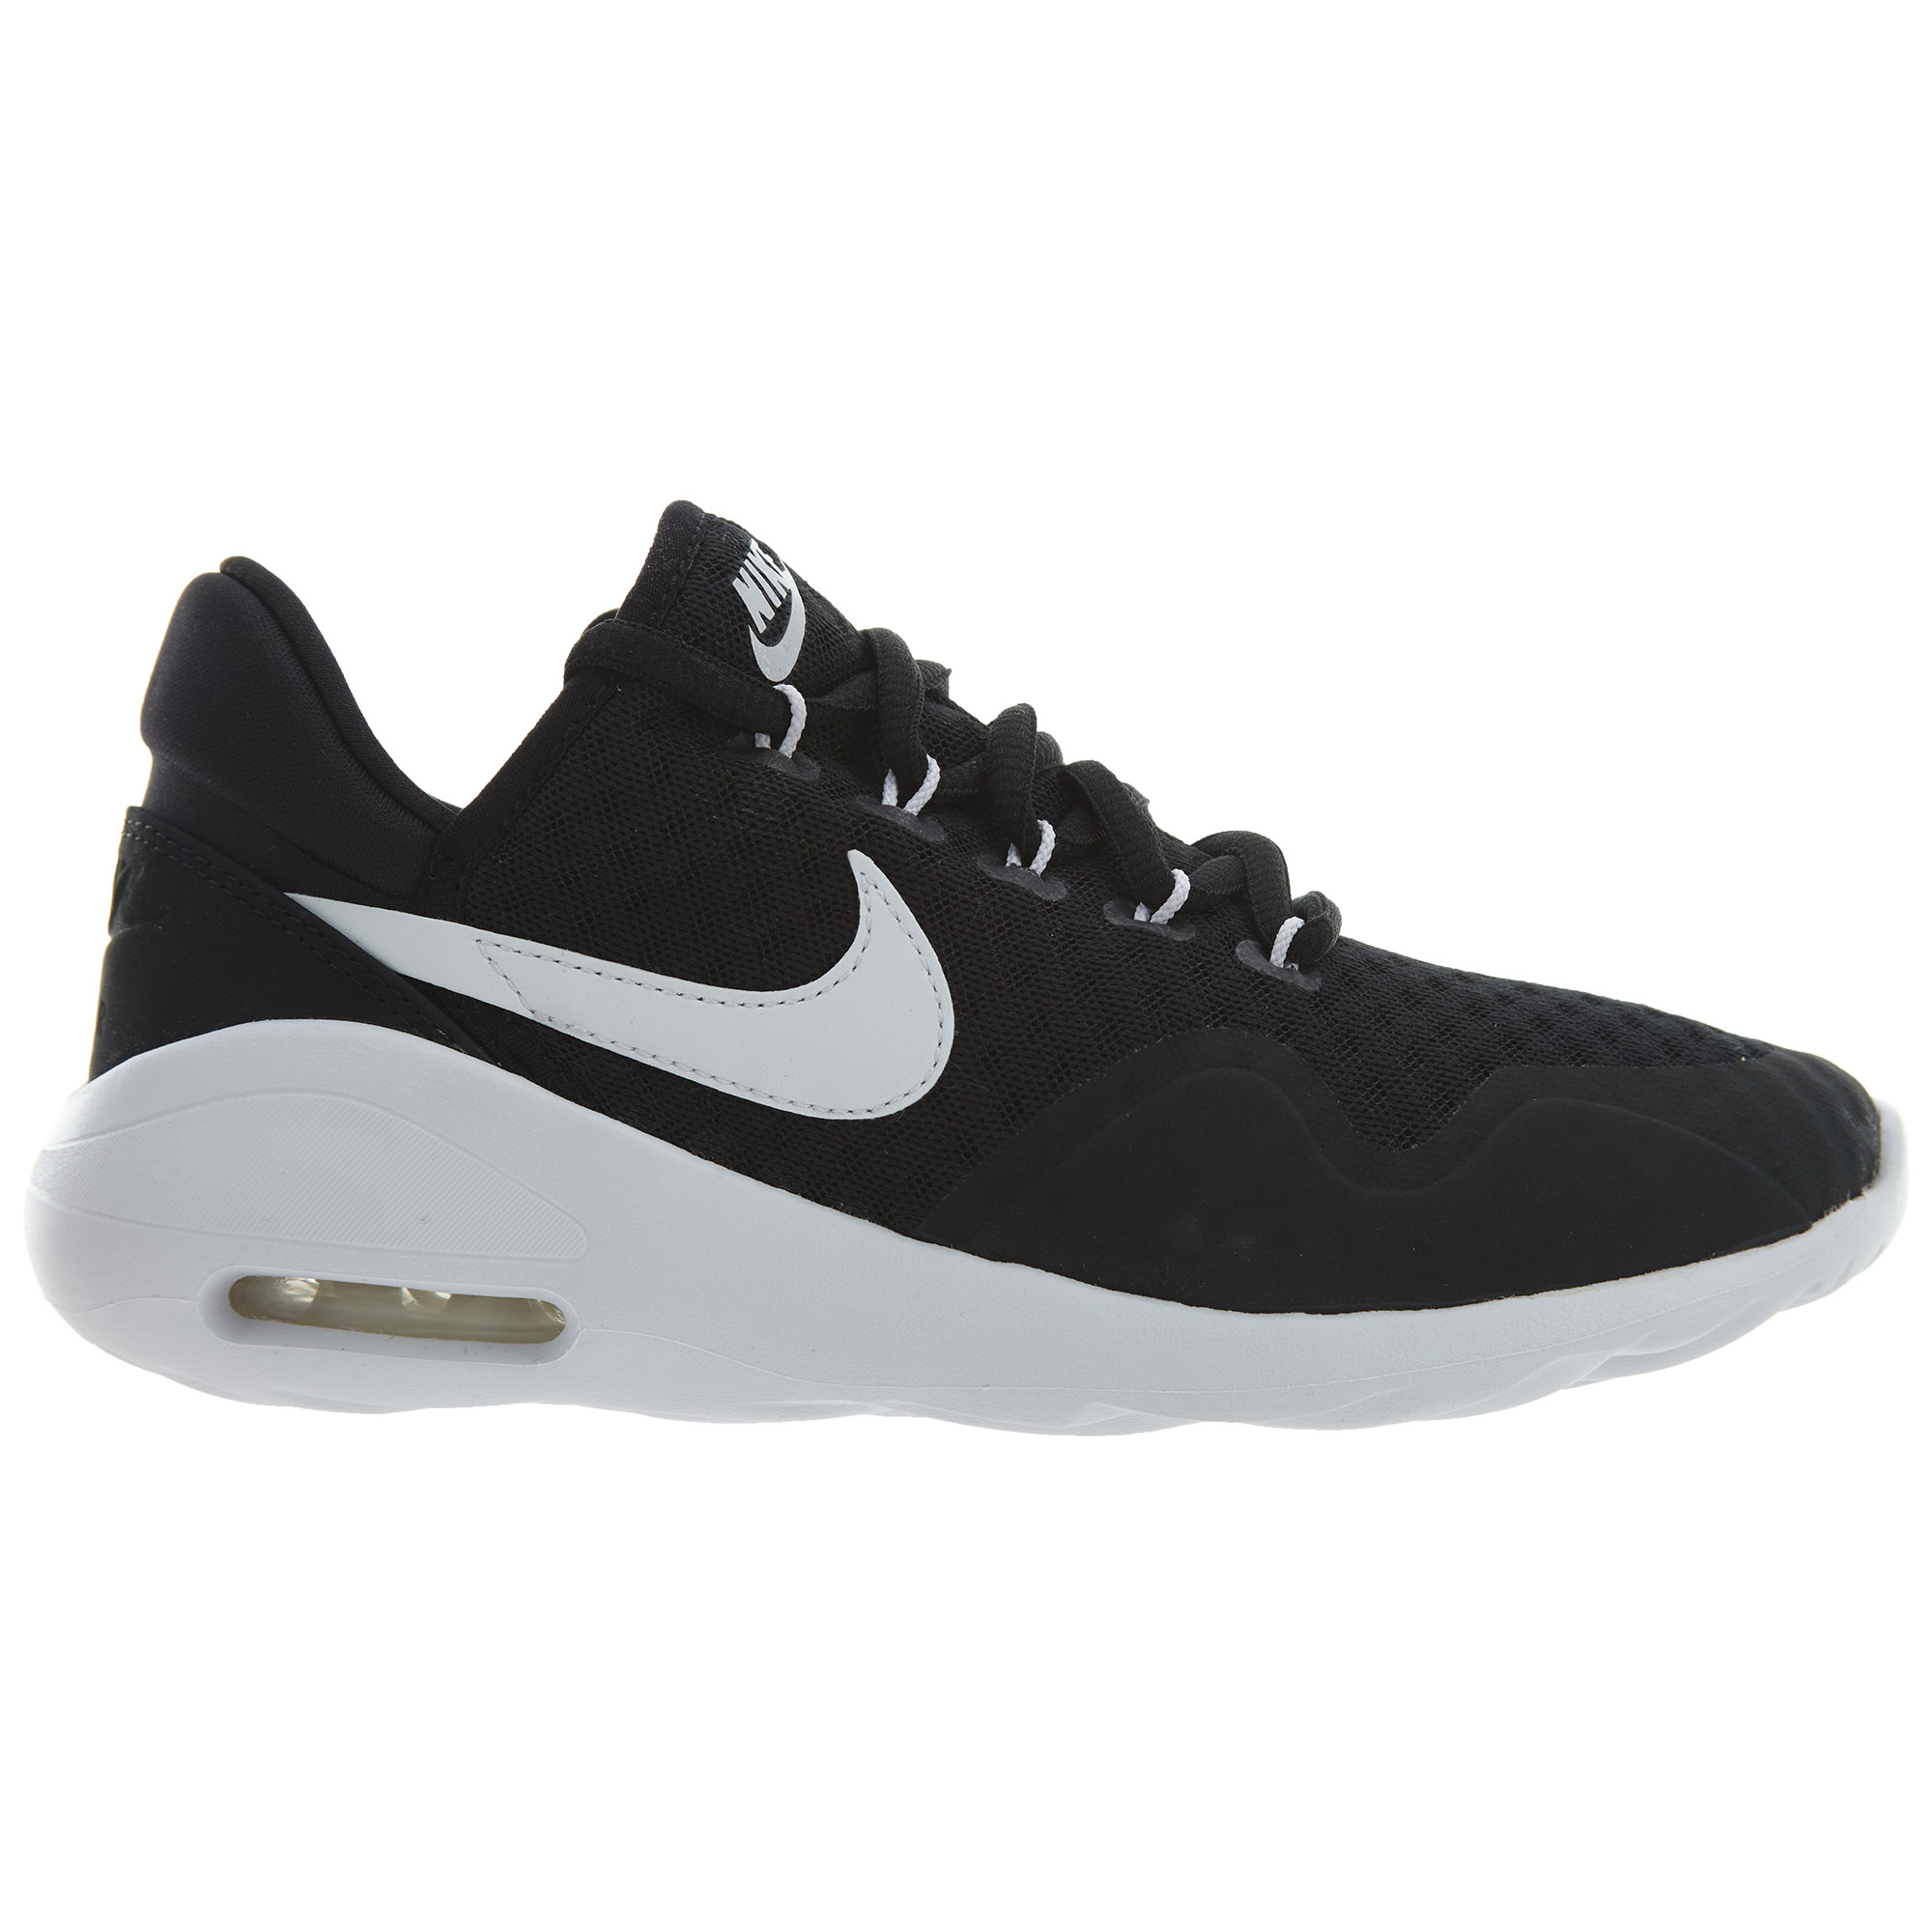 Nike Air Max Sasha Black White-Black